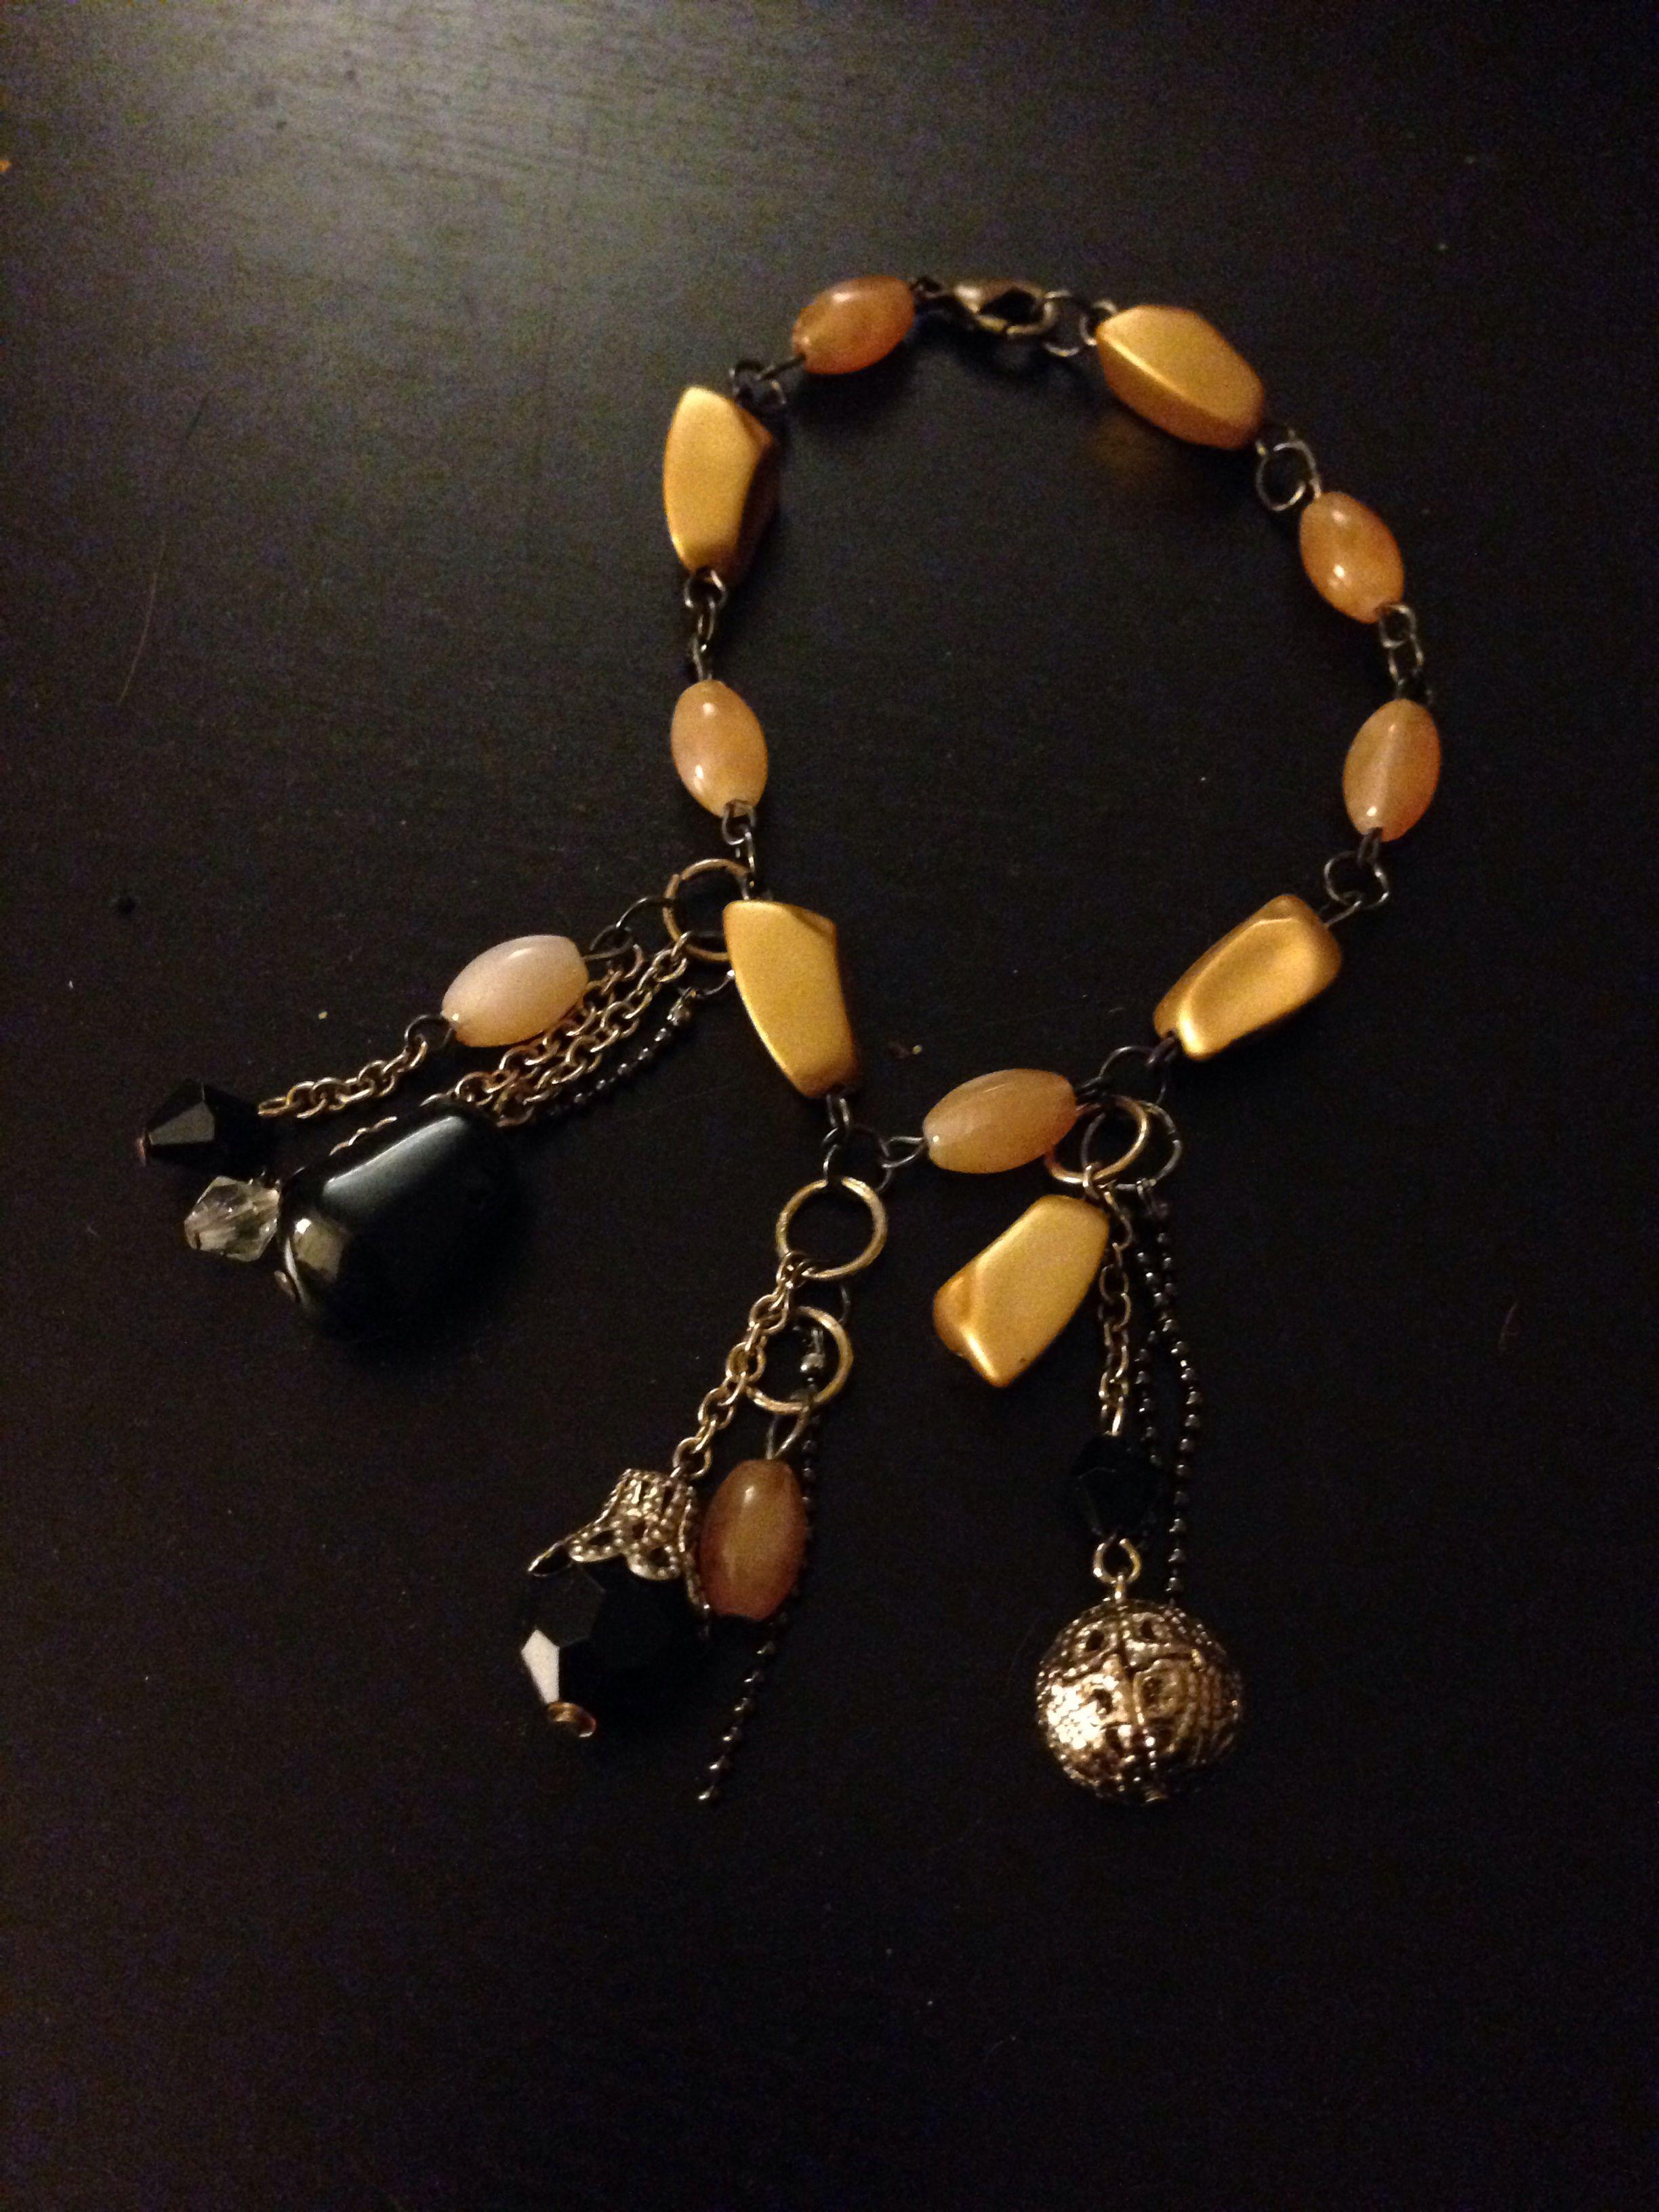 Old world charm bracelet